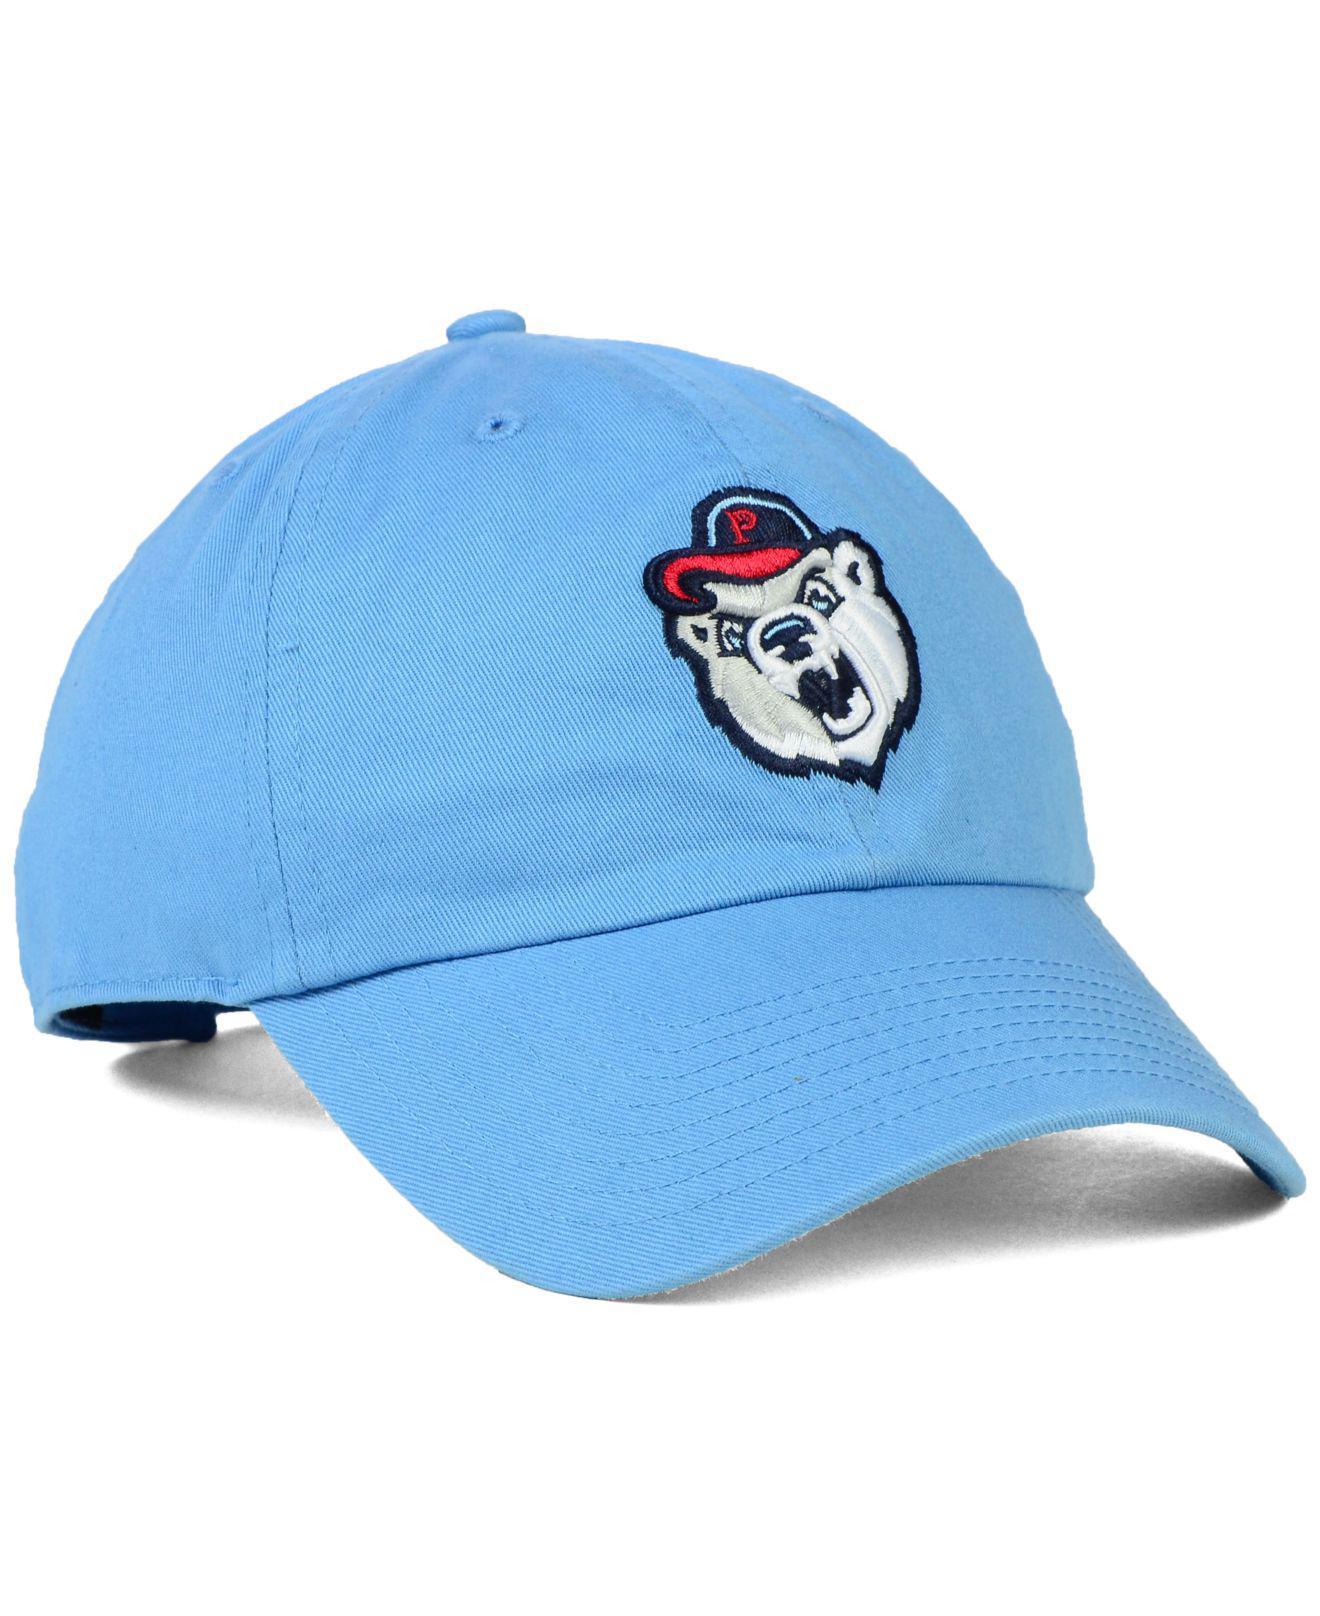 classic a7a23 523b7 ... Pawtucket Red Sox Clean Up Cap for Men - Lyst. View fullscreen